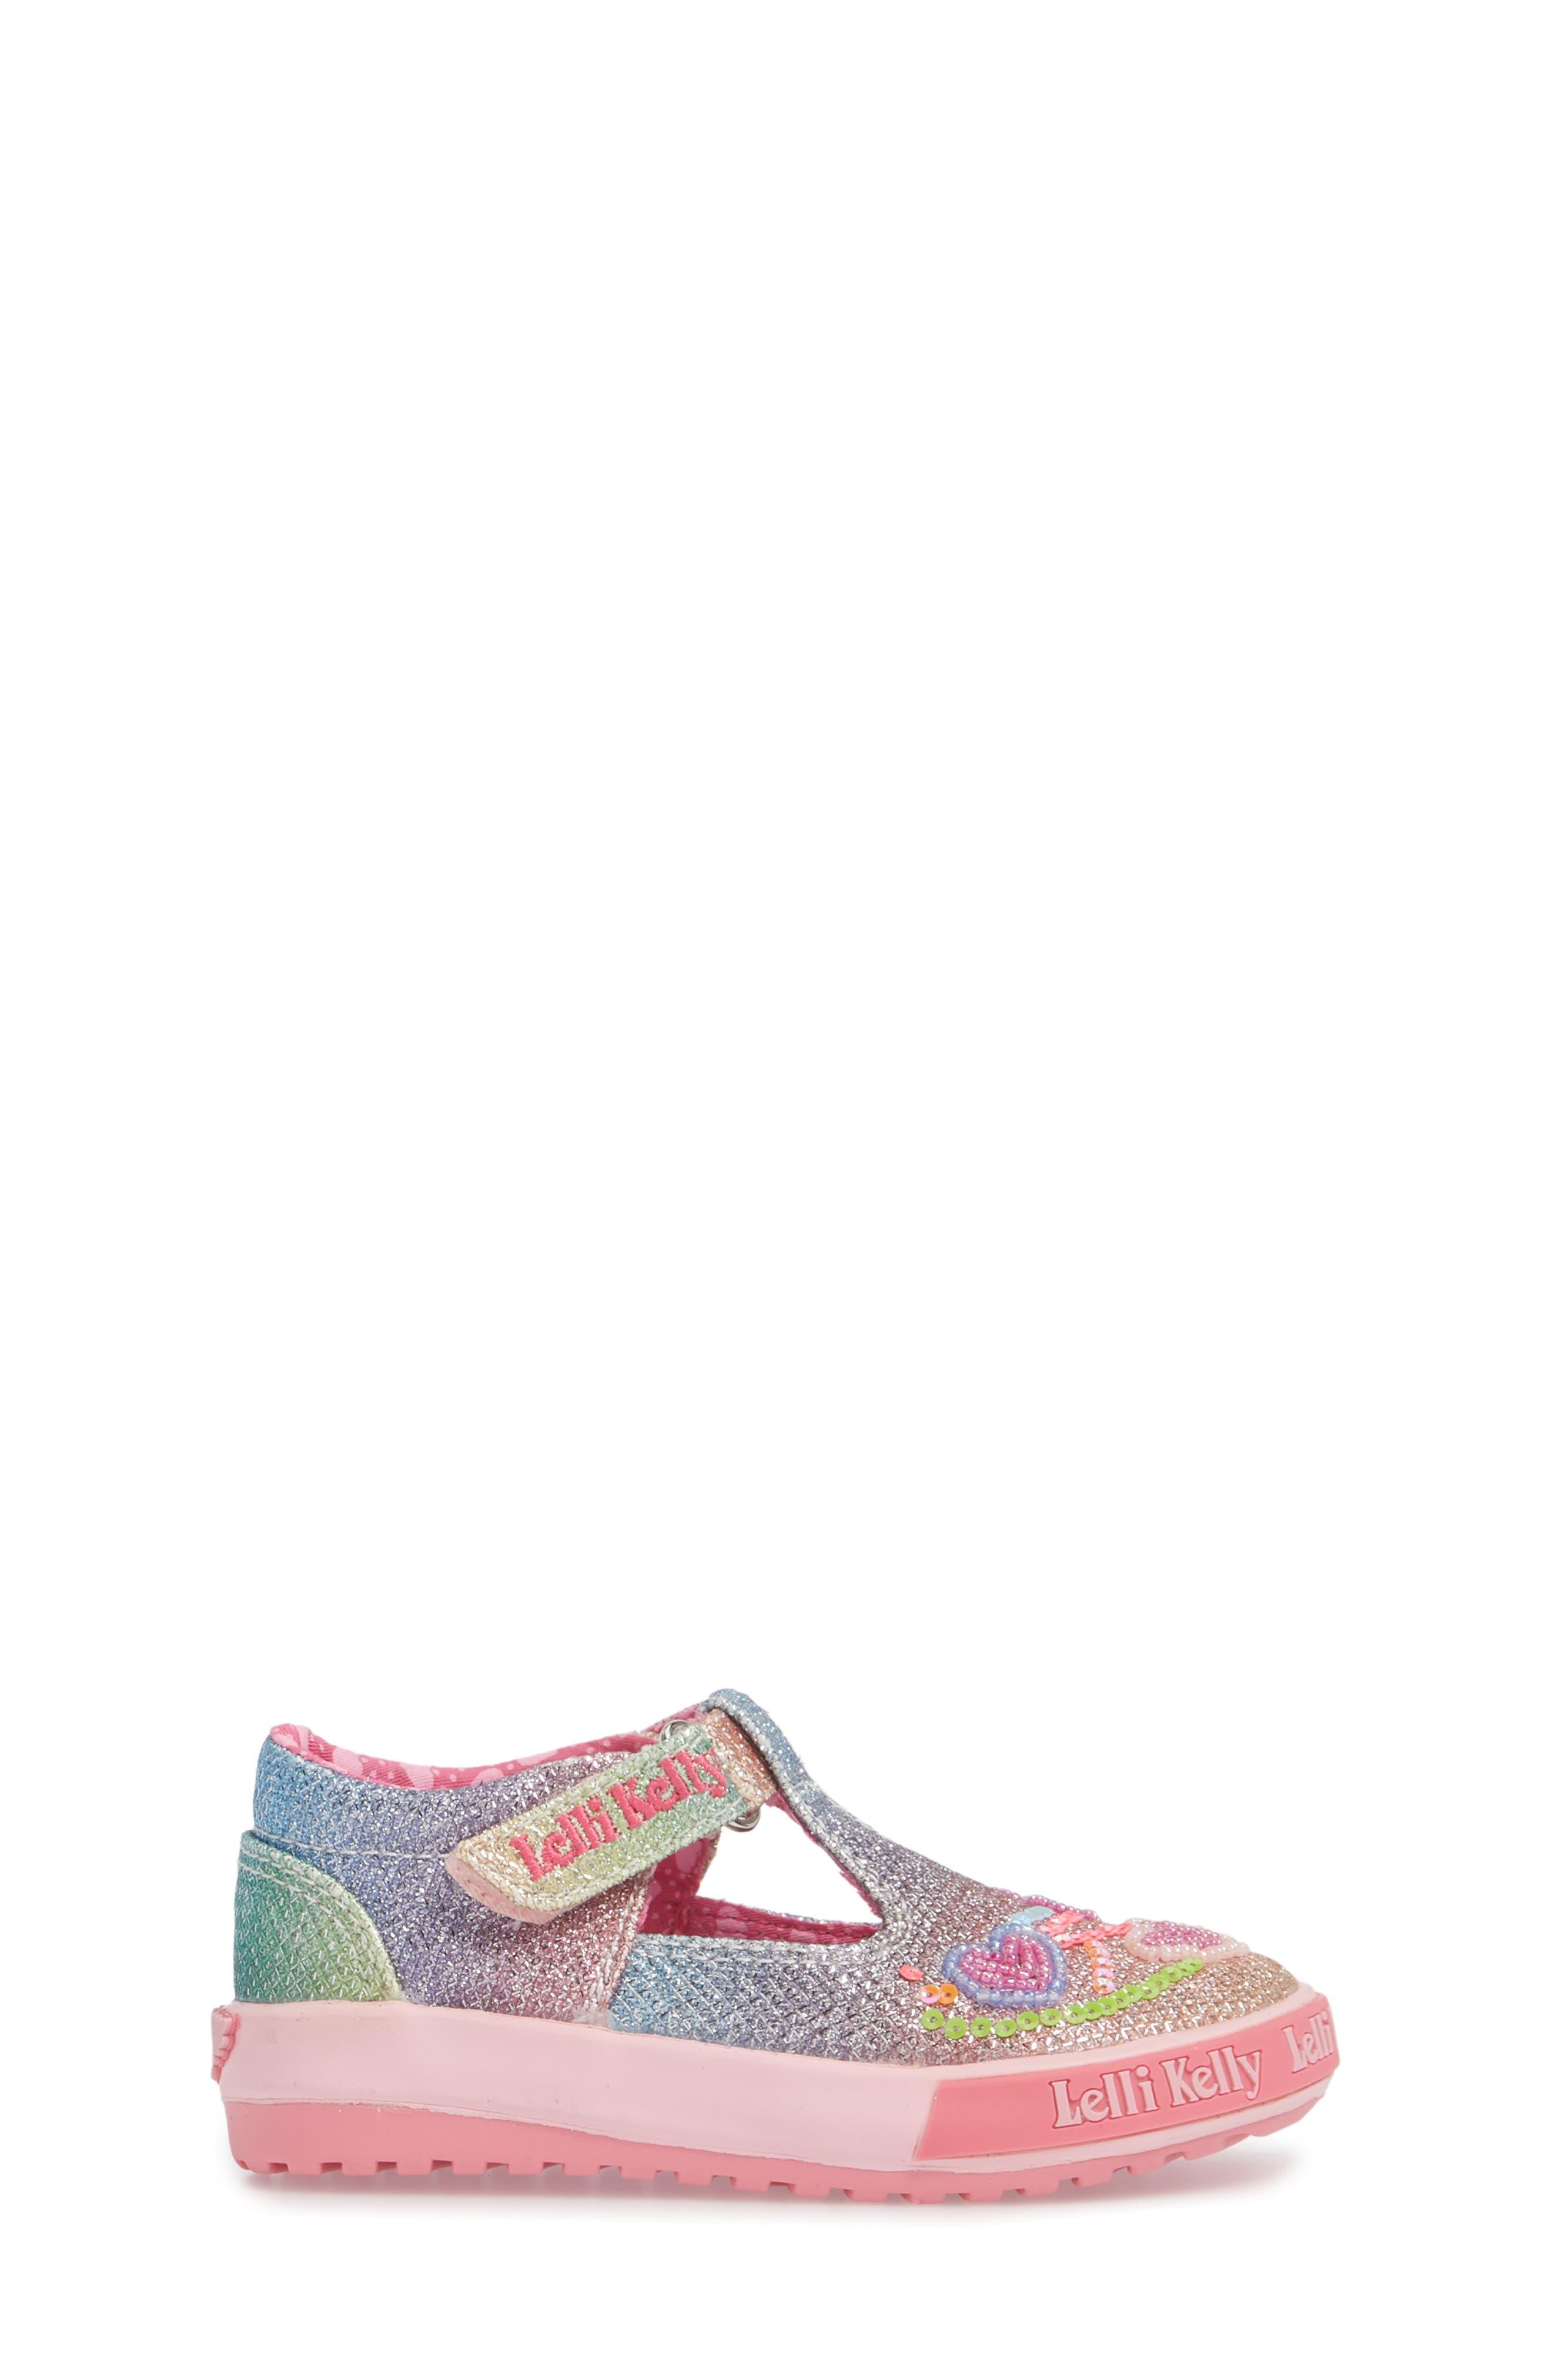 LELLI KELLY,                             Glitter Metallic T-Strap Mary Jane,                             Alternate thumbnail 3, color,                             320